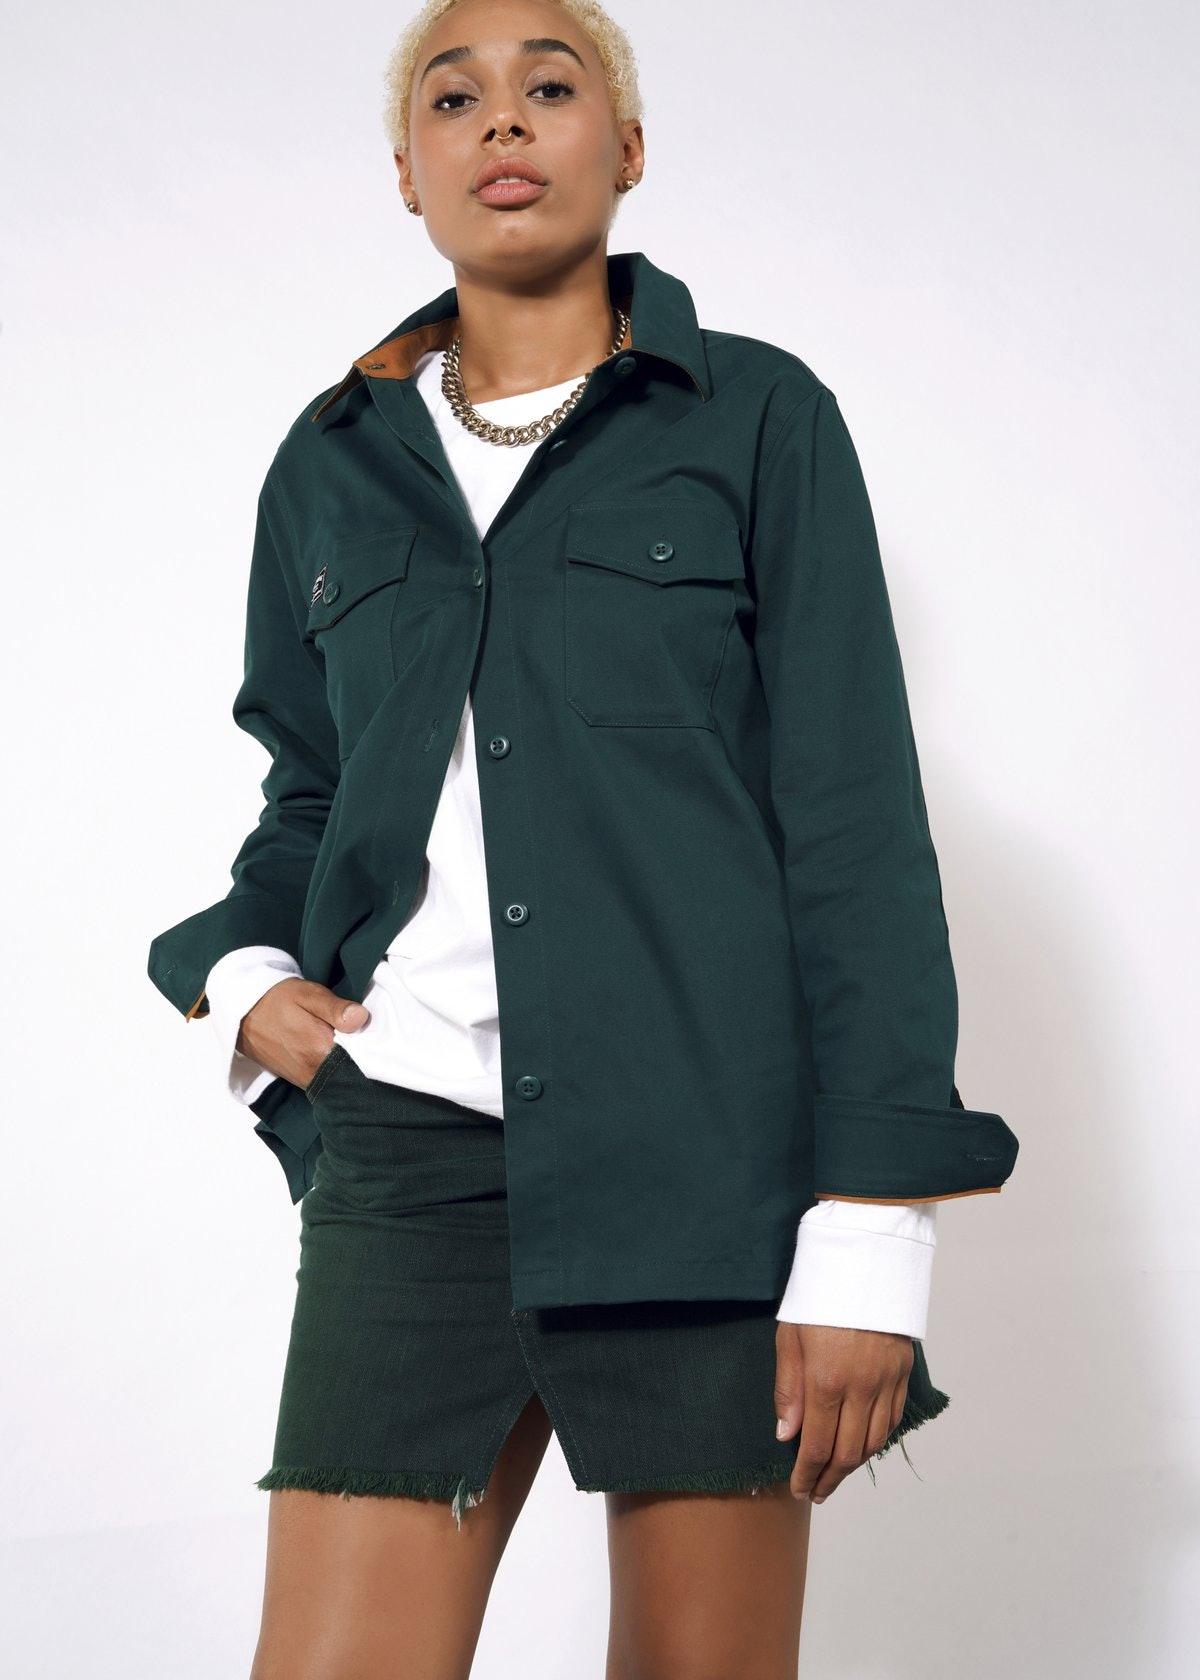 Wildfang Workwear Shacket